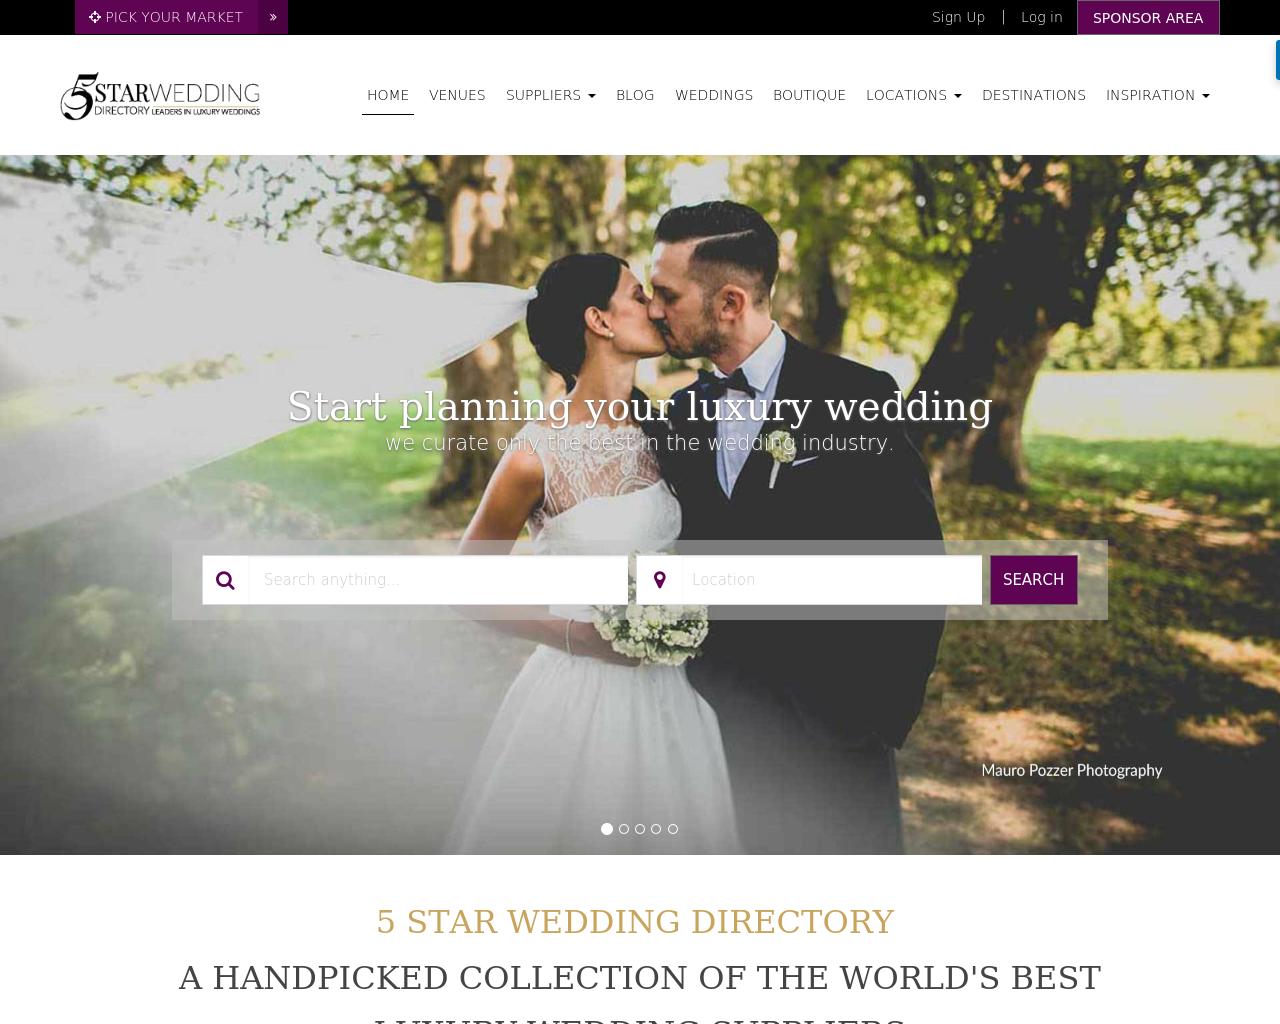 5-STAR-WEDDING-DIRECTORY-Advertising-Reviews-Pricing